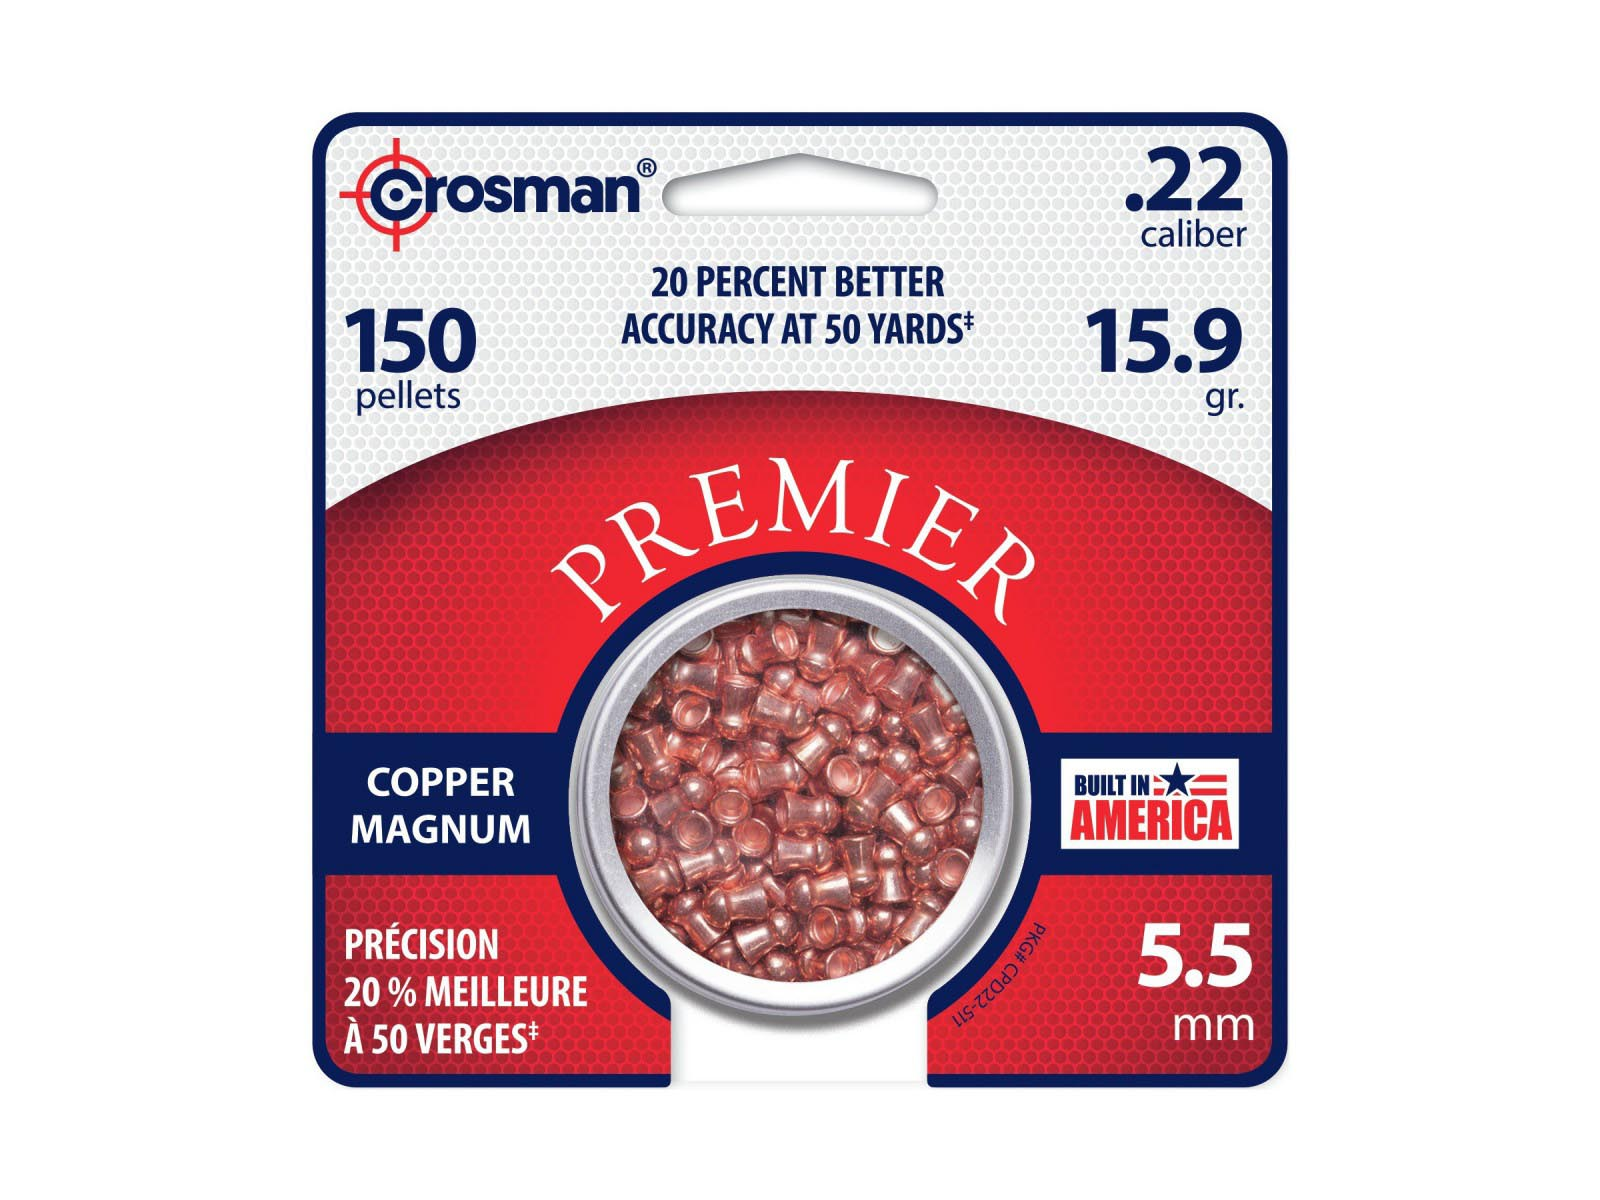 Crosman Premier Copper Magnum .22 Cal, 15.9 gr - 150 ct